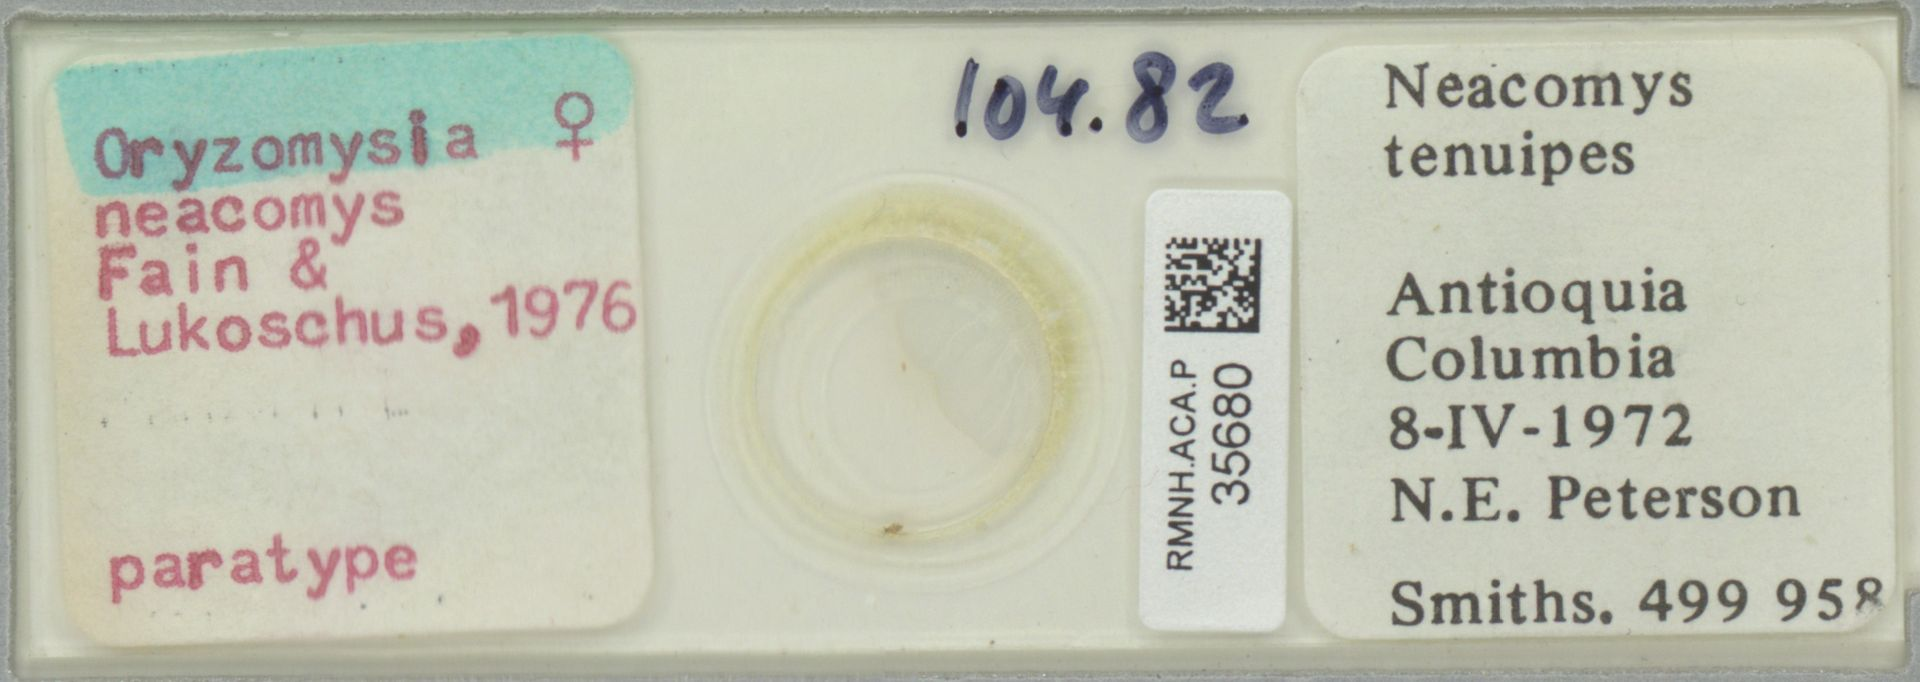 RMNH.ACA.P.35680 | Oryzomysia neacomys Fain & Lukoschus, 1976